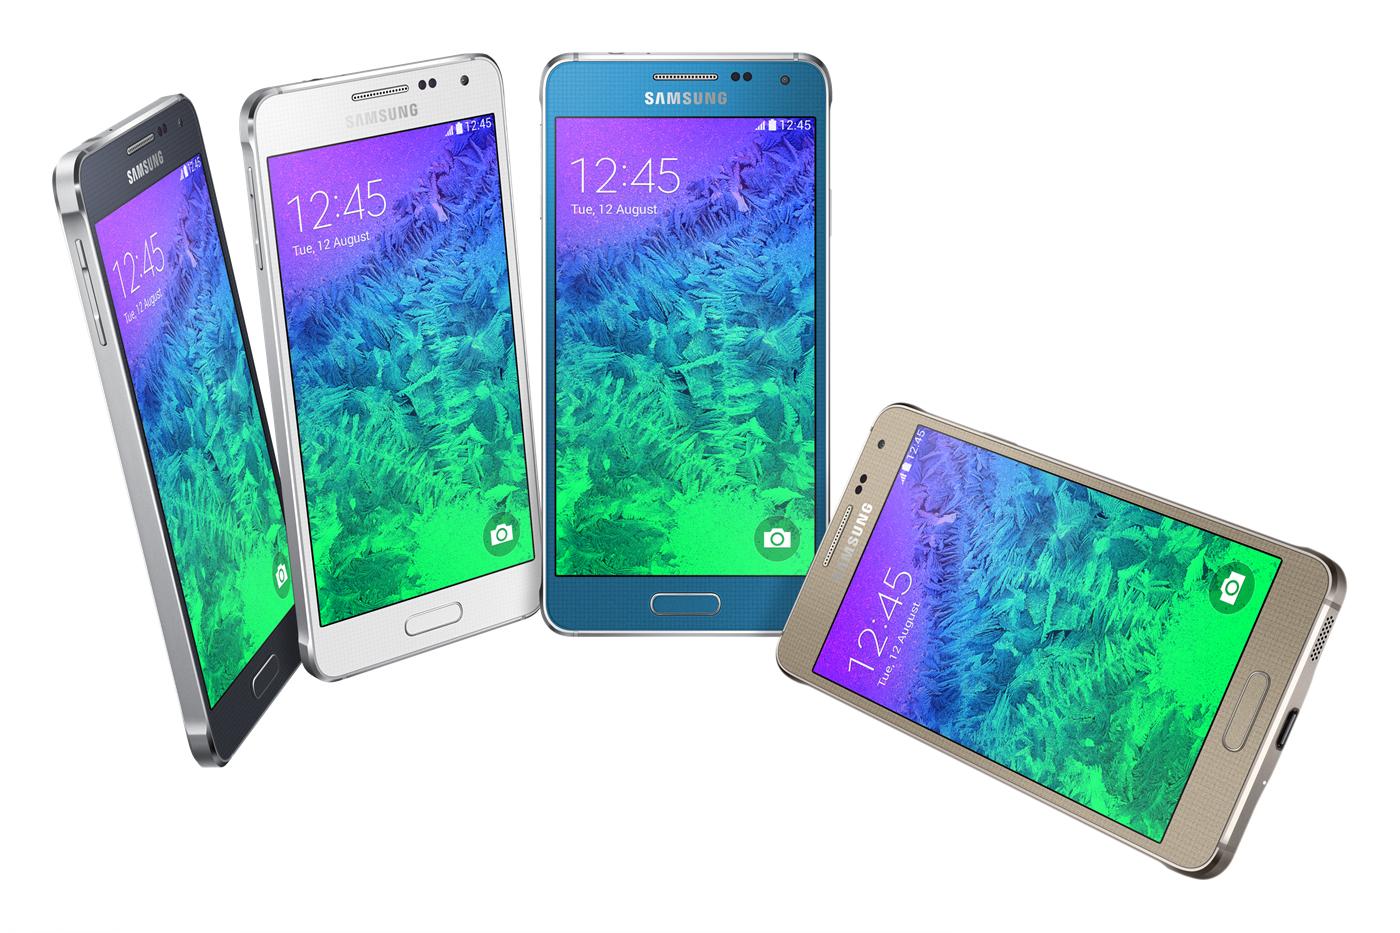 Samsung Galaxy Alpha Confirmed